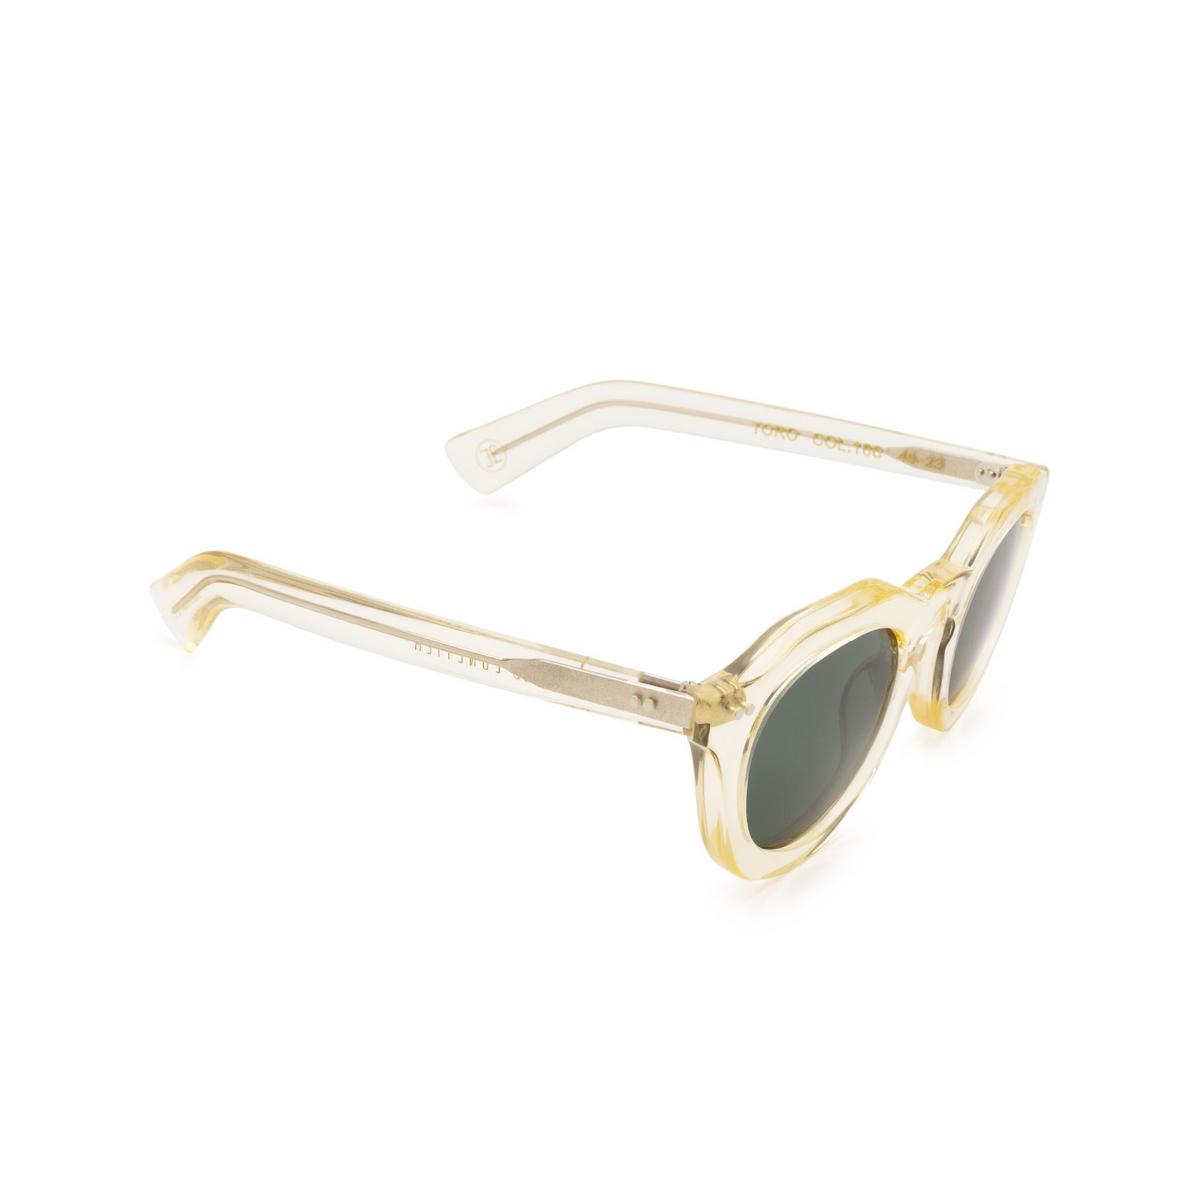 Lesca® Irregular Sunglasses: Toro color Champagne 186 - three-quarters view.